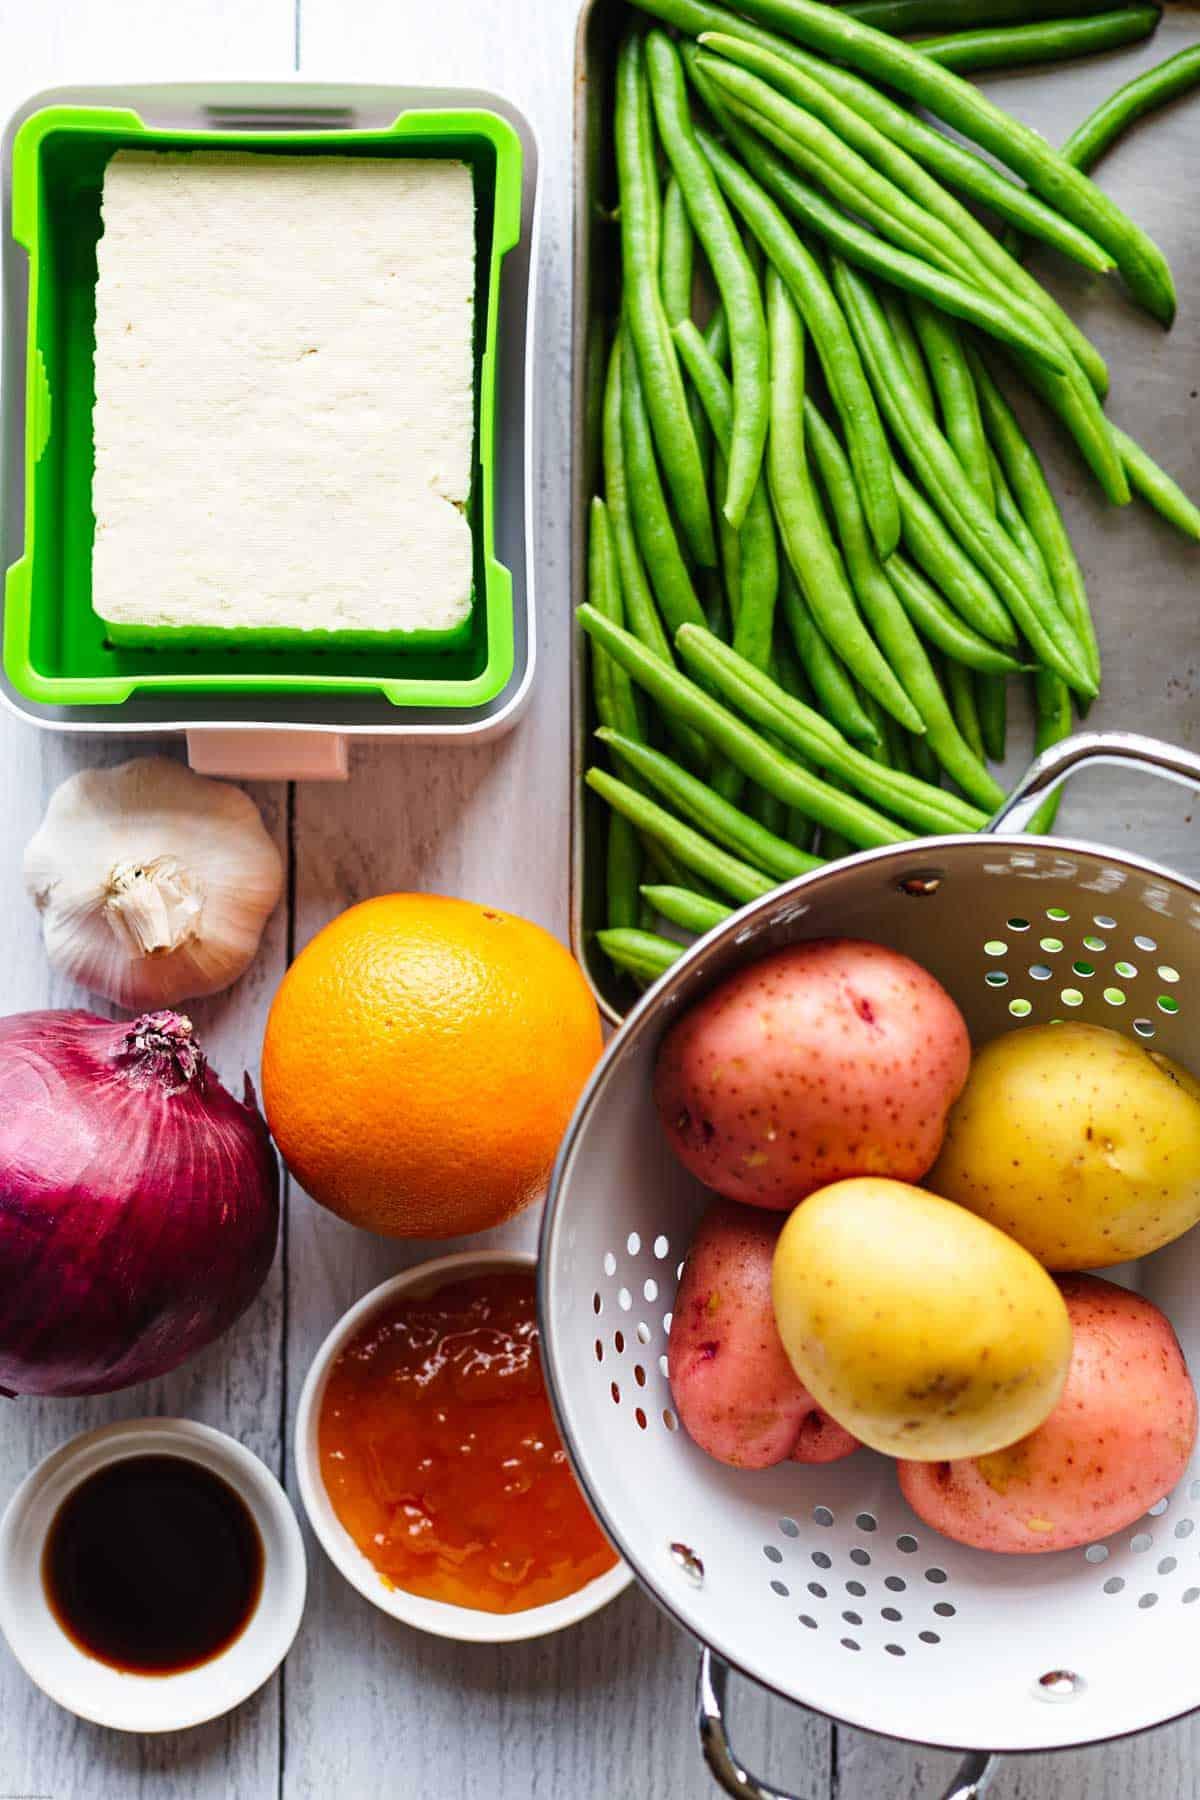 Ingredients: Tofu, green beans, Yukon Gold potatoes, red potatoes, orange, peach preserves, red onion, garlic.